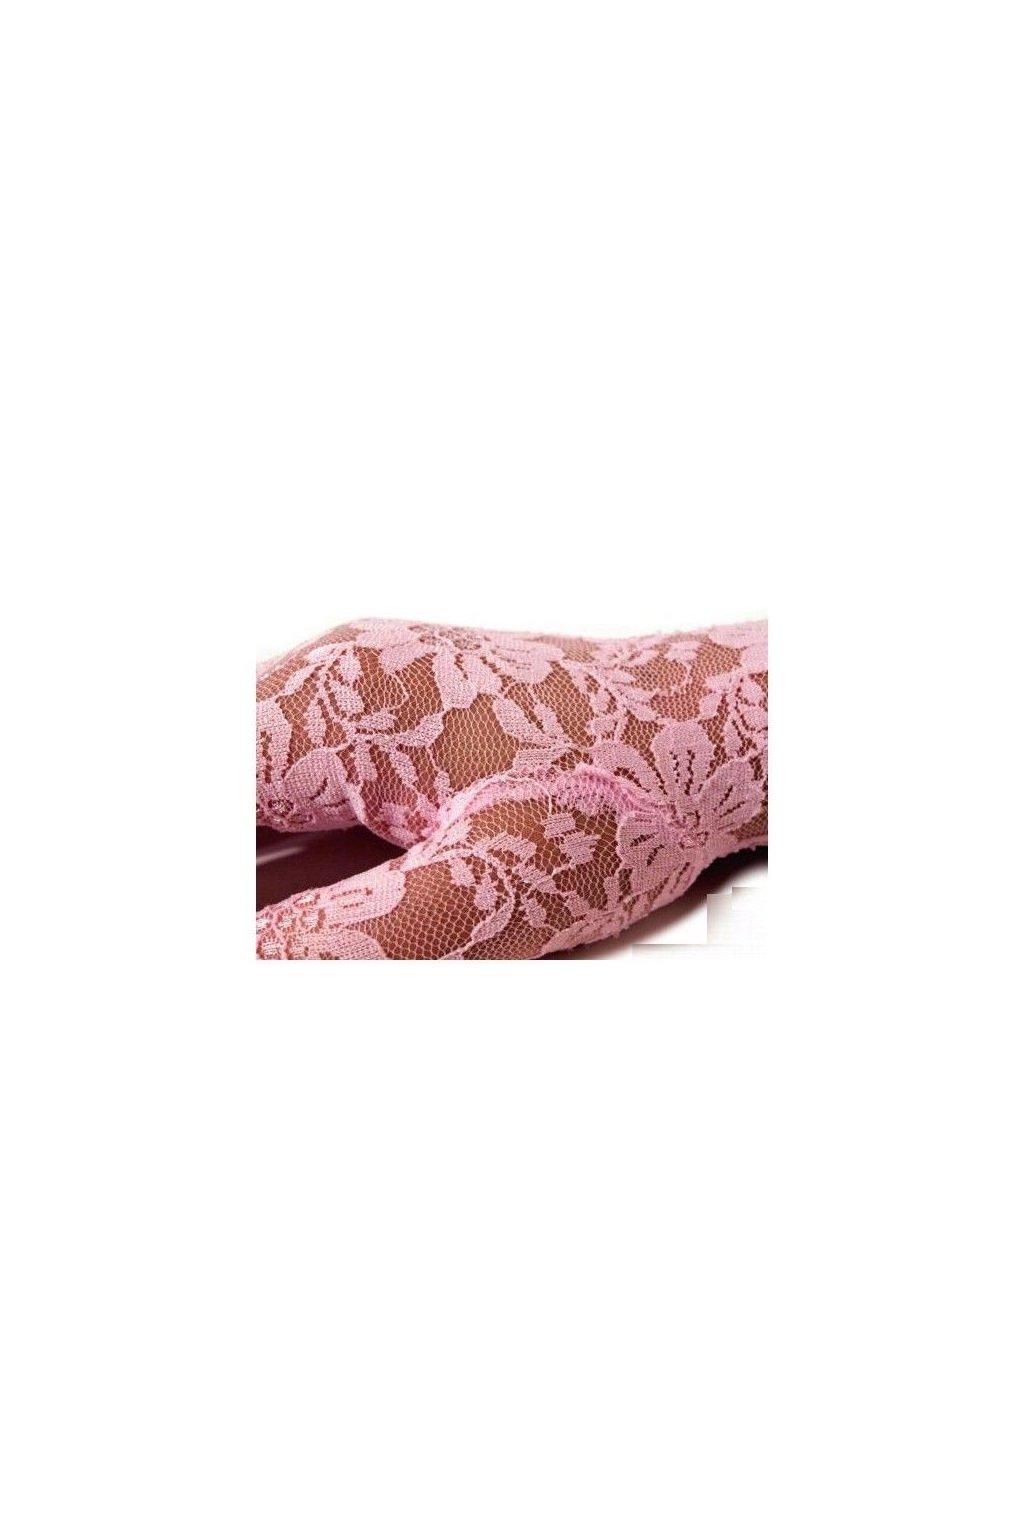 Krajkové rukavice - růžové